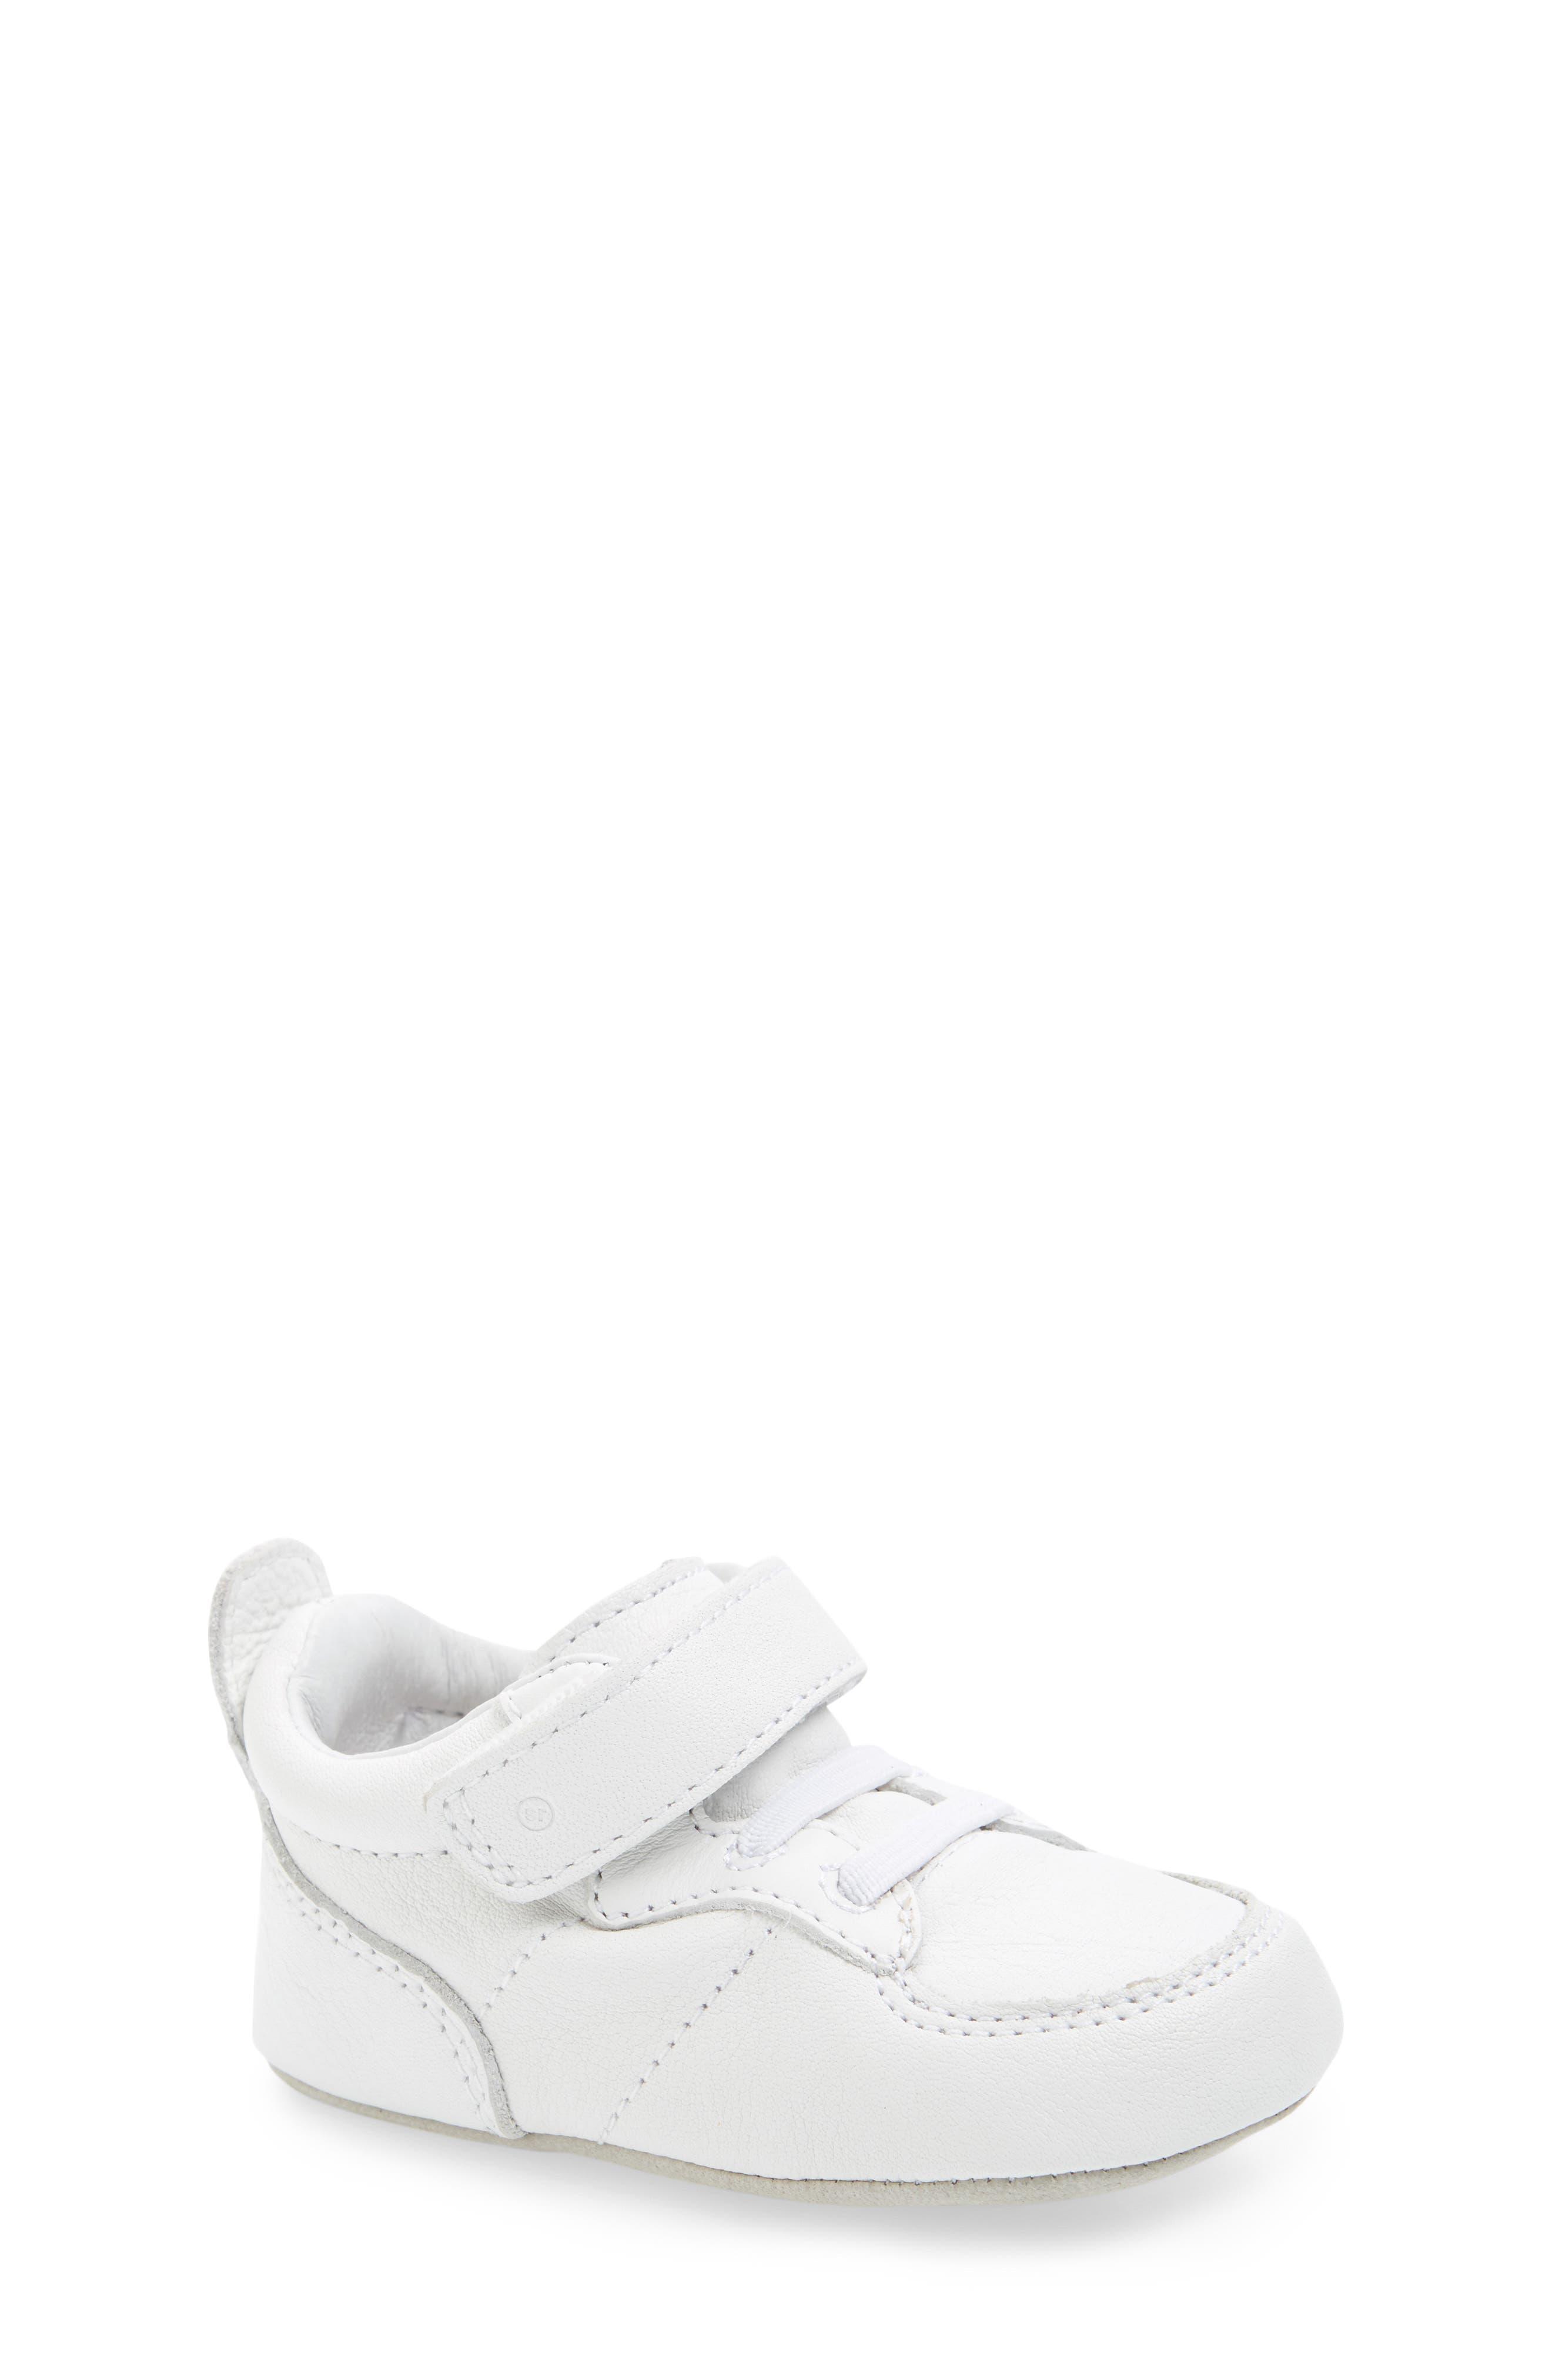 Stride Rite Lights Lux Sneaker (Baby, Toddler & Little Kid)